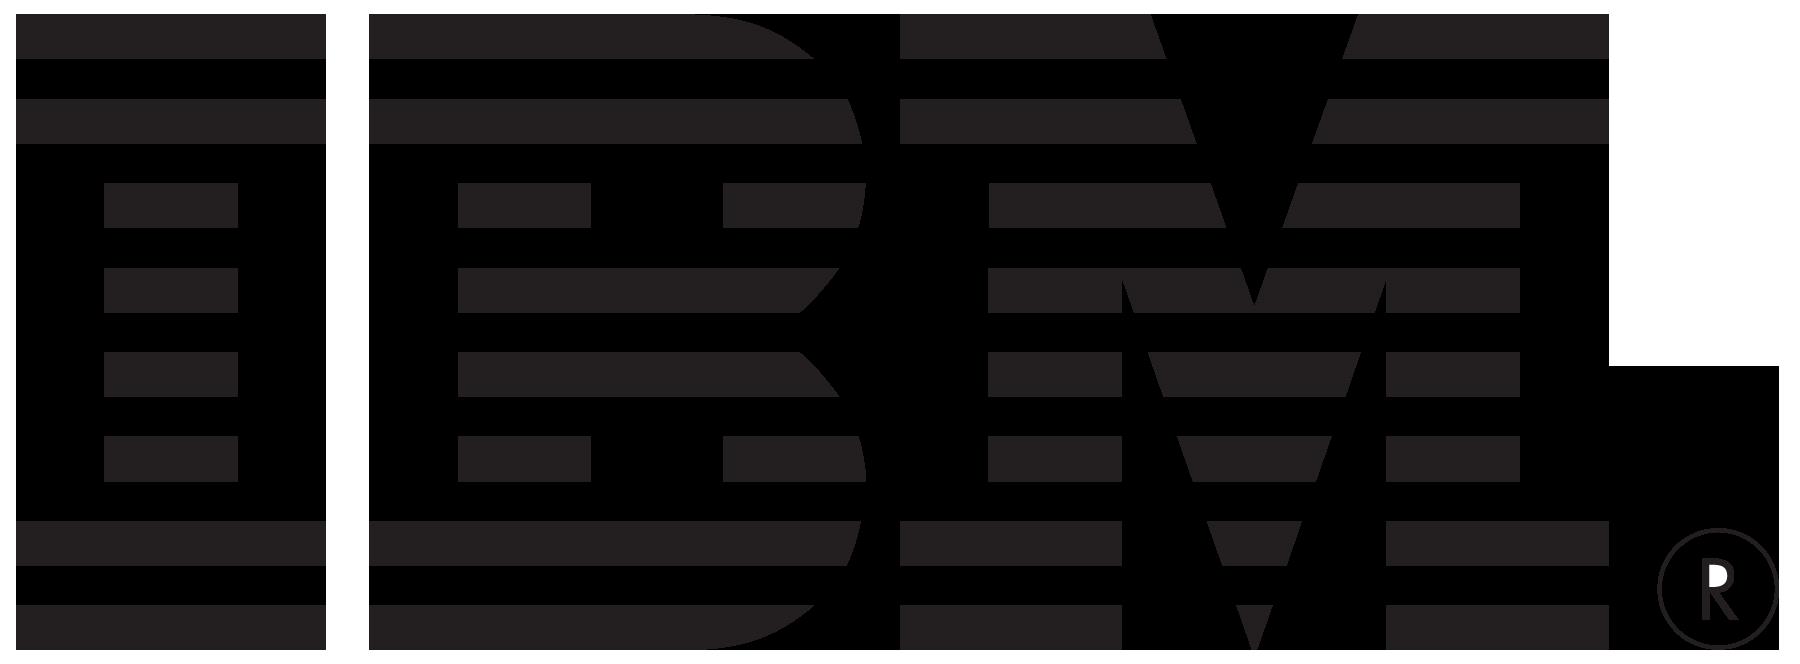 Mobi Mobility Open Blockchain Initiative Ibm Logos Ibm Logo Logos